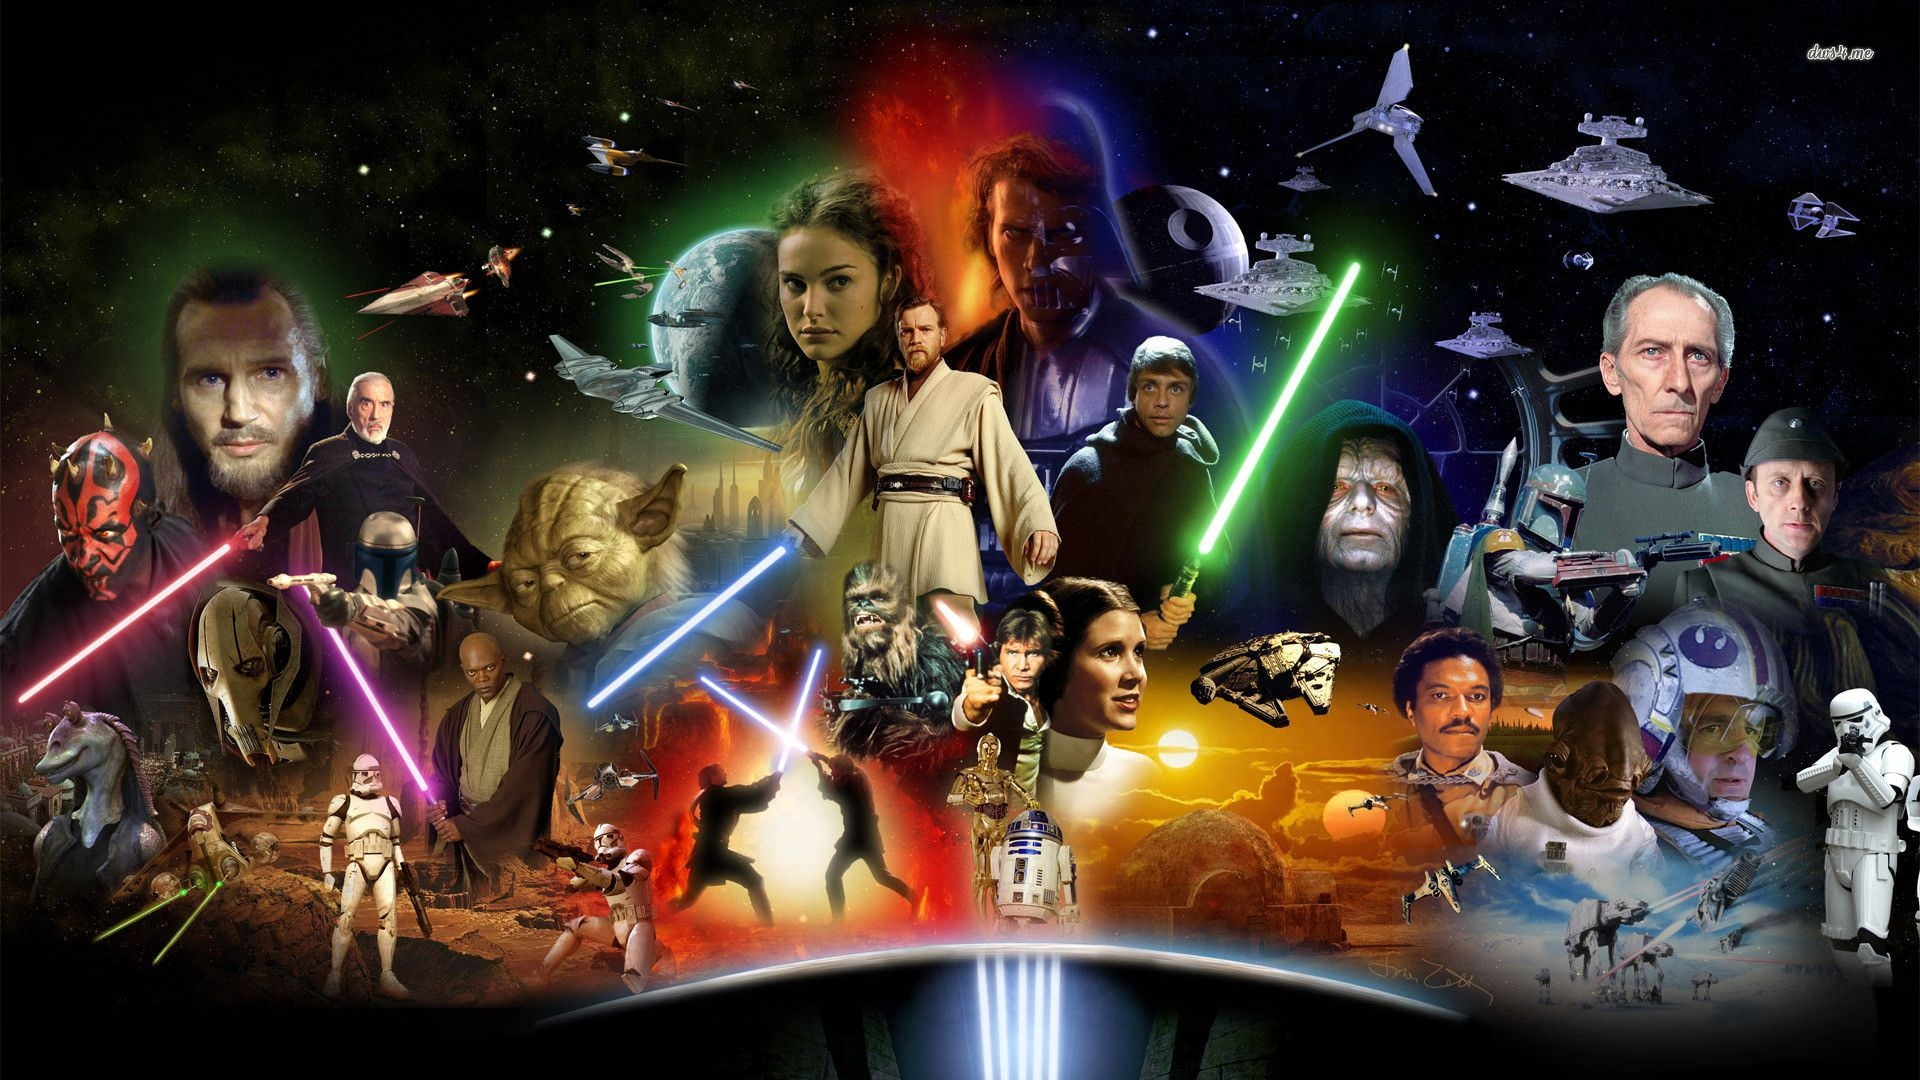 Star Wars Wallpaper For Download